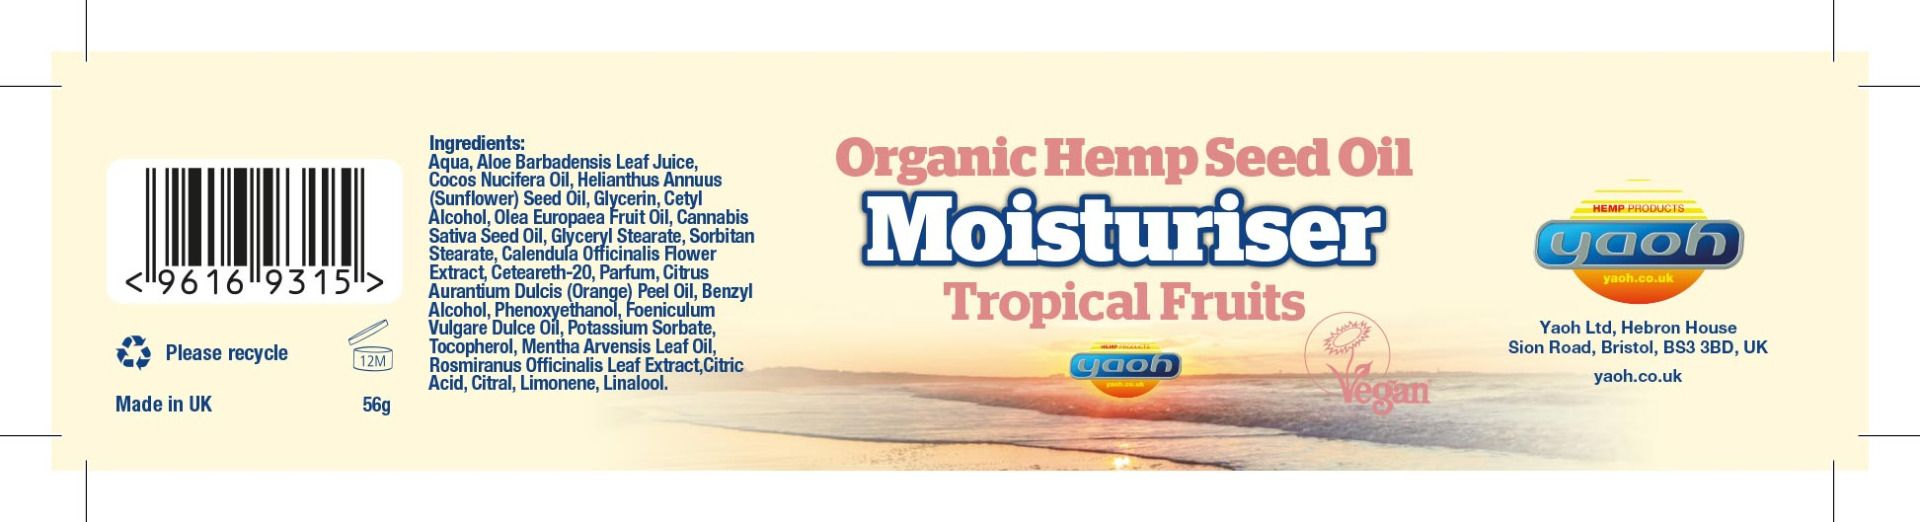 Hemp Seed Oil Moisturiser - Tropical Fruits